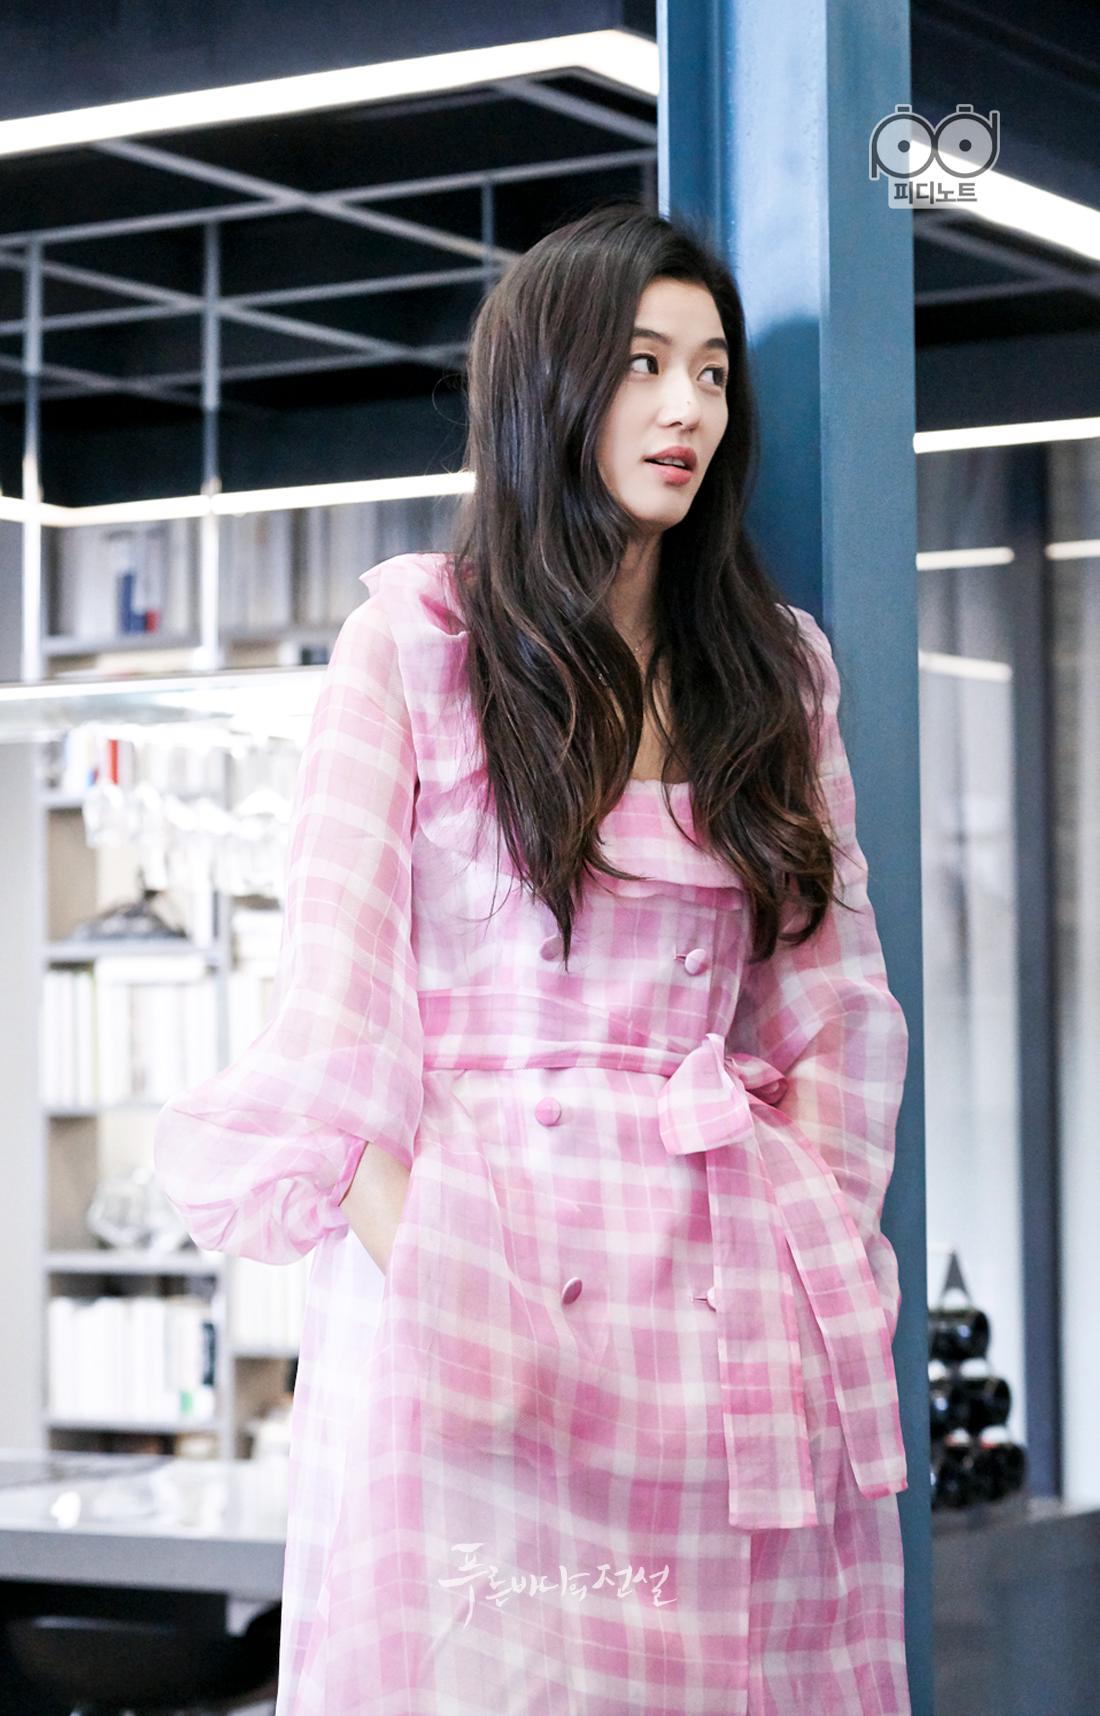 d9fb38b7412 Legend of the blue sea. Jeon ji hyun. Lee min ho. Simchung. Simcheong. Jun  ji hyun. Heo jun jae. Heo joon jae. Kim dam ryeong. Popular korean drama  2016